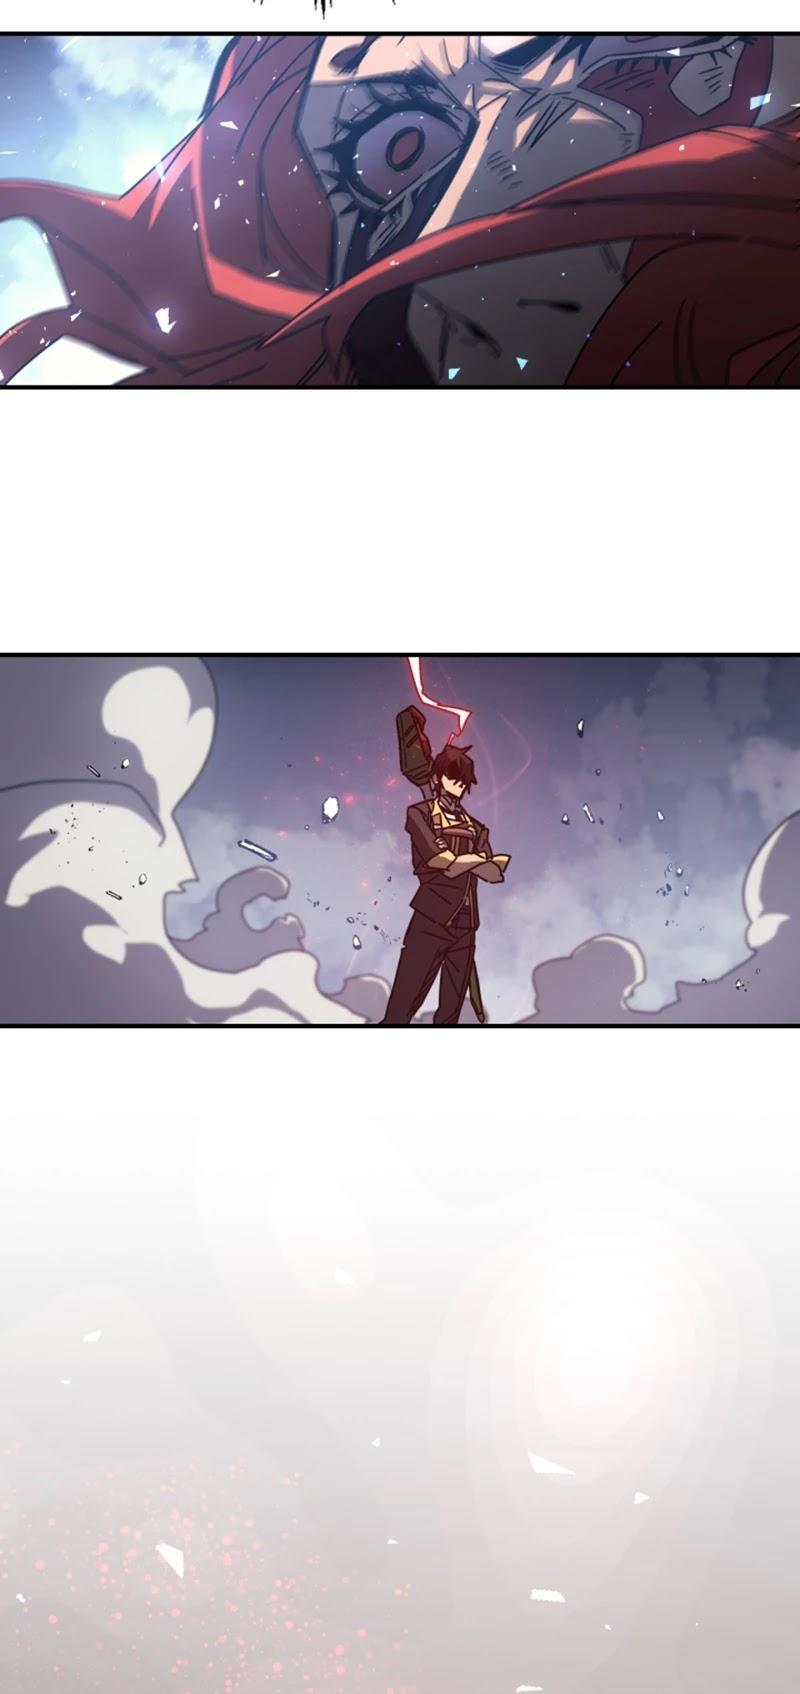 A Returner's Magic Should Be Special Chapter 161 page 45 - Mangakakalot